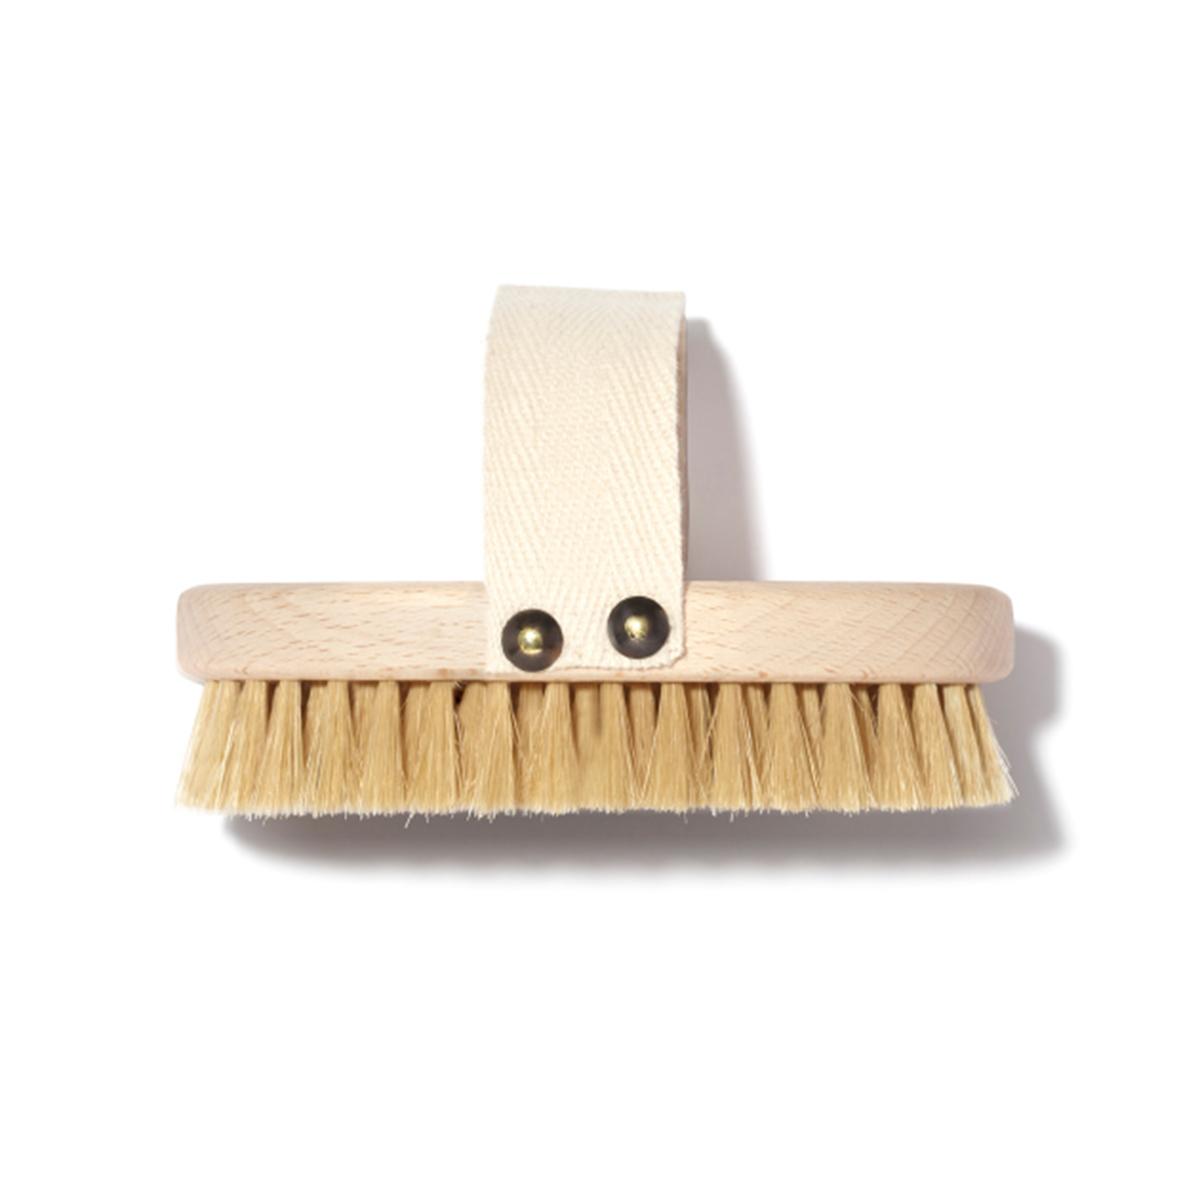 Dry Brush Bristles